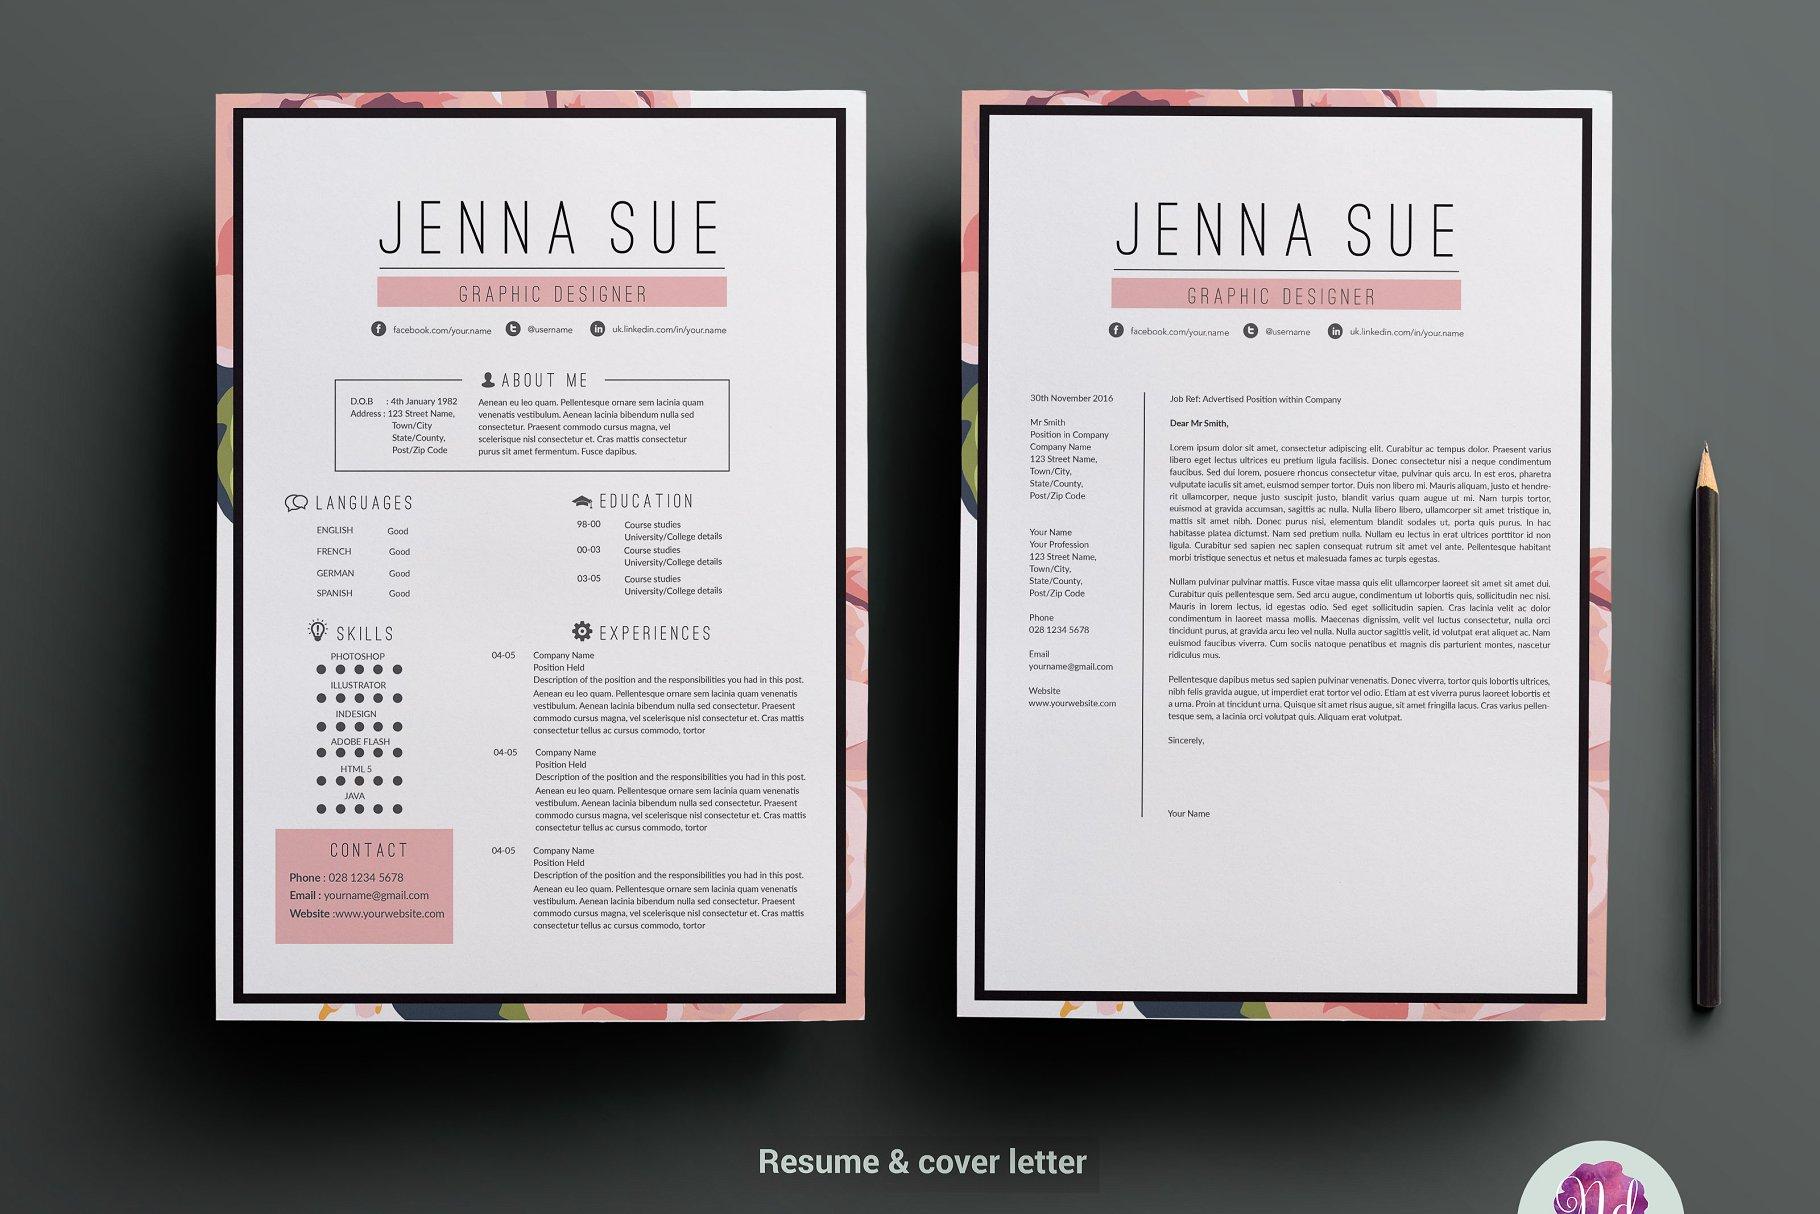 resume-1-1-16.jpg